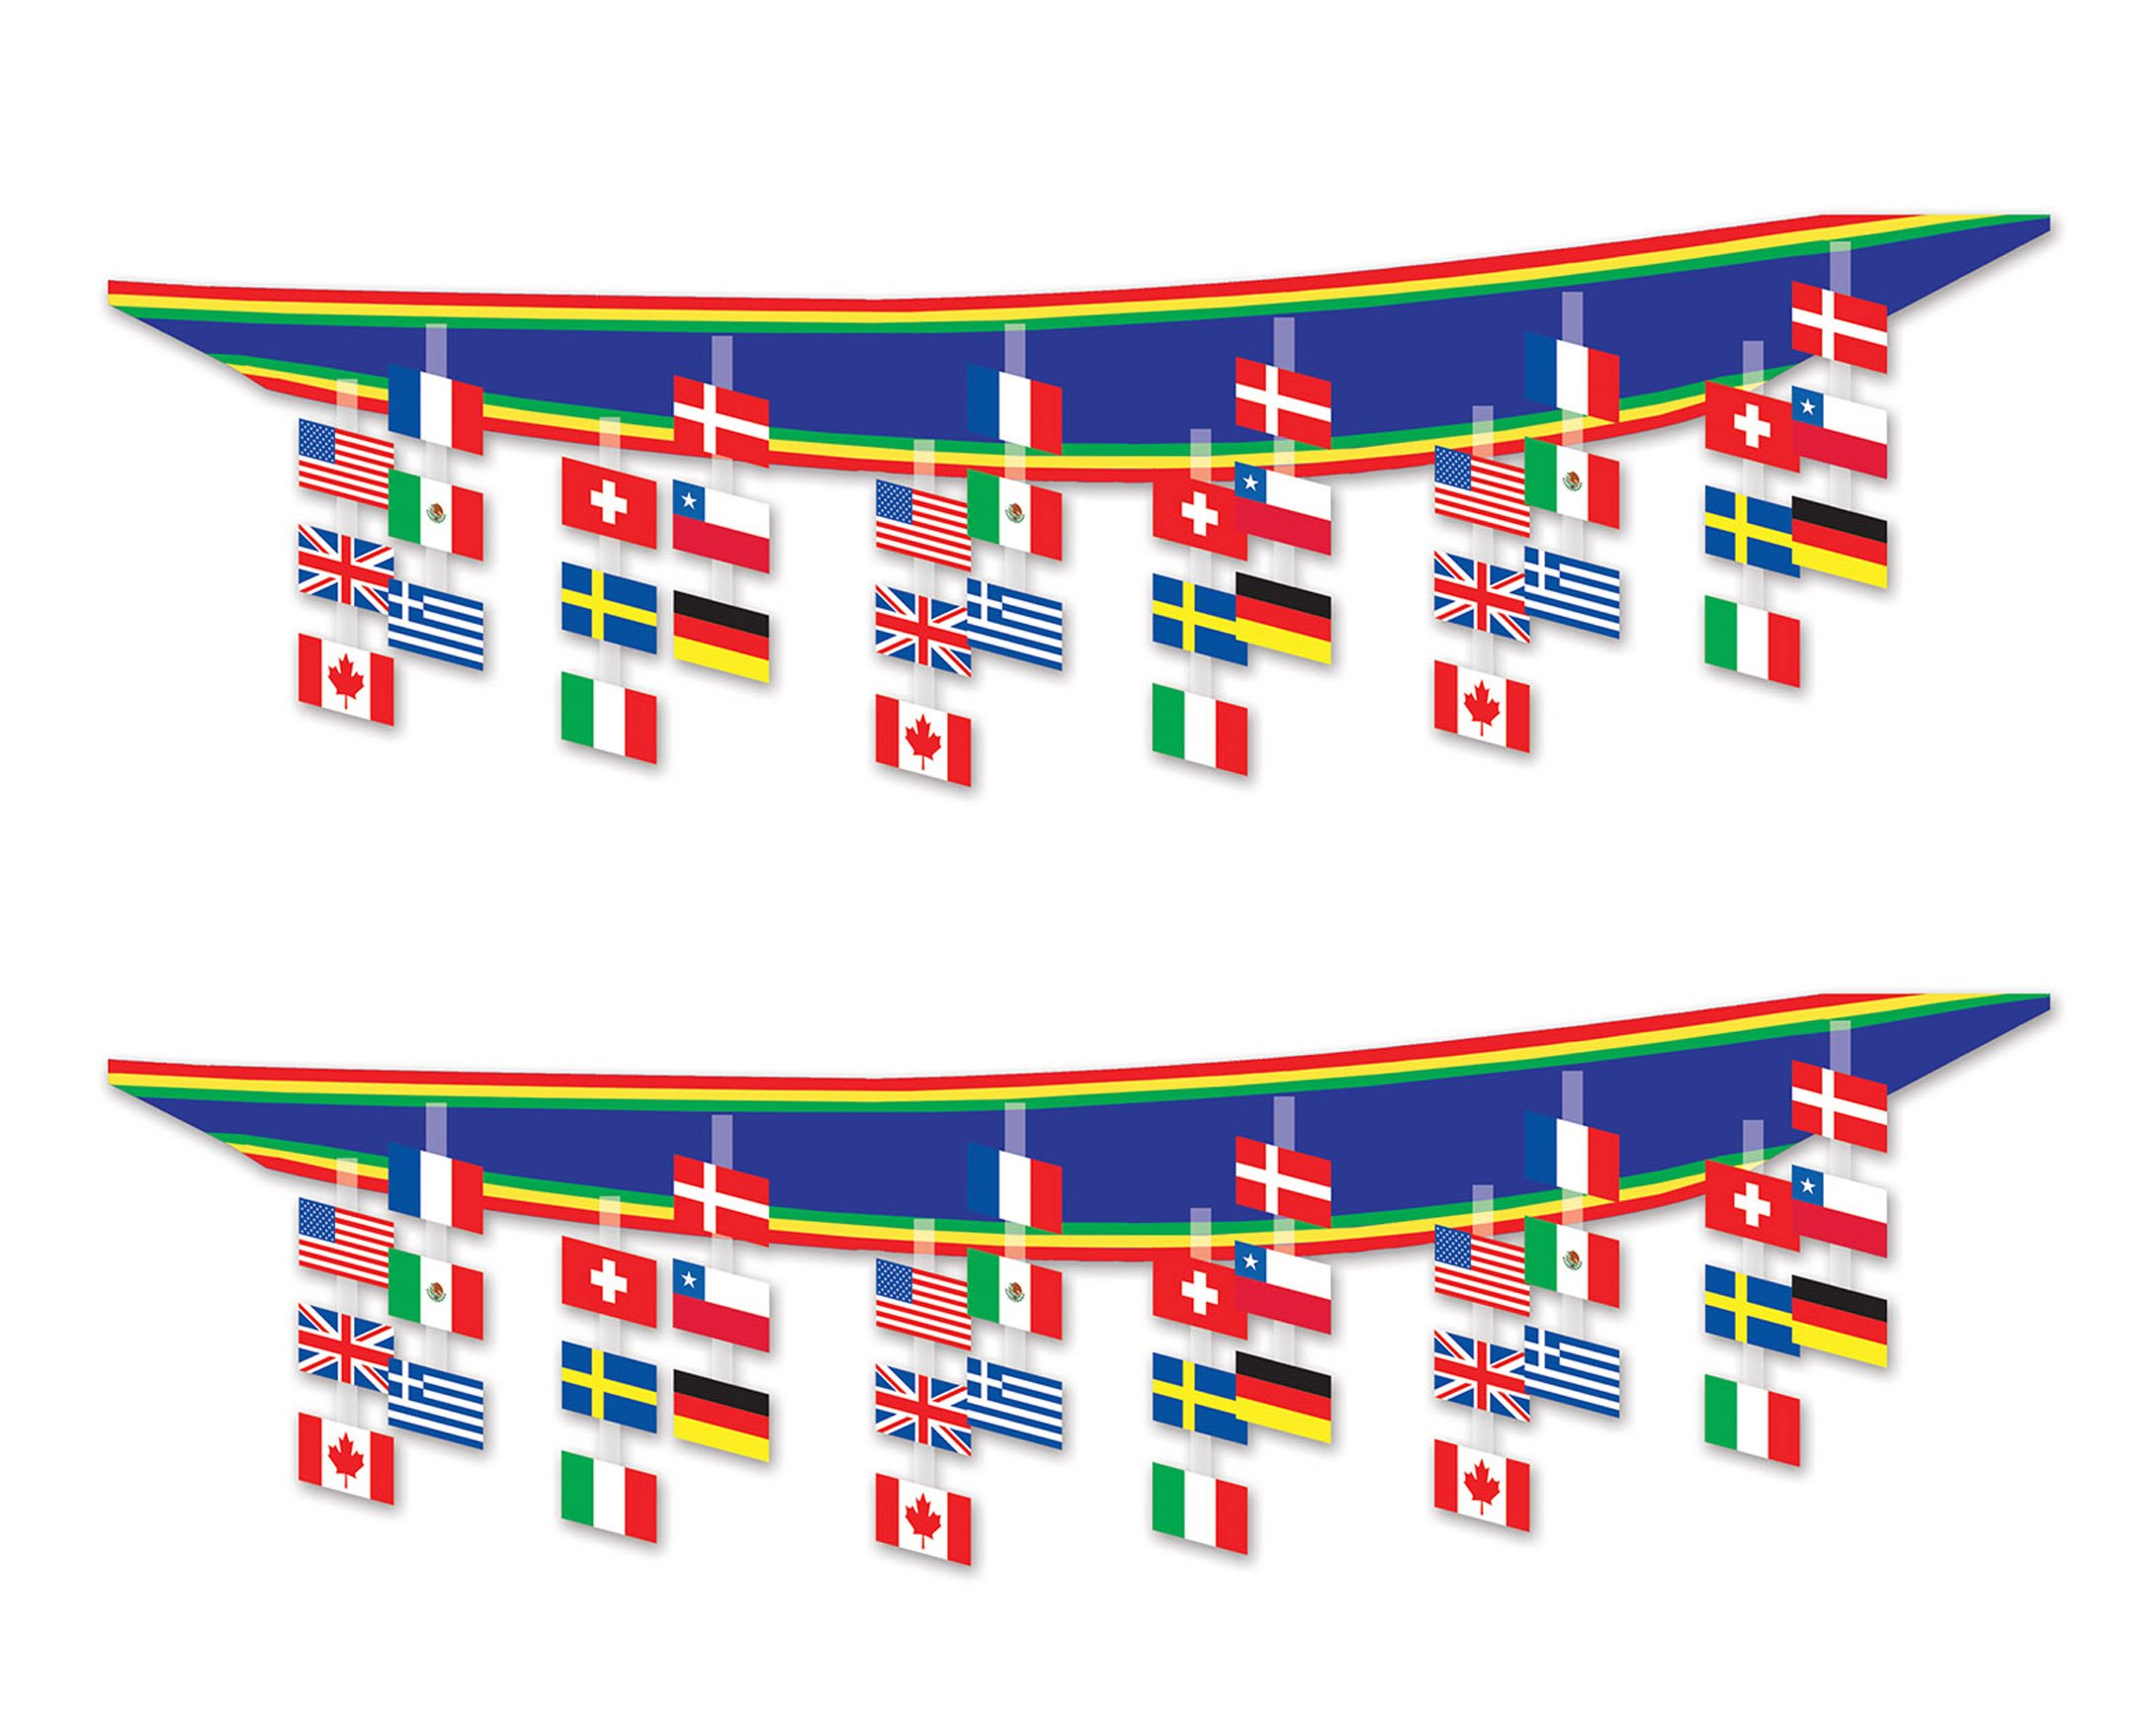 Beistle S50337AZ2, 2 Piece International Flag Ceiling Décor, 12'' x 12' by Beistle